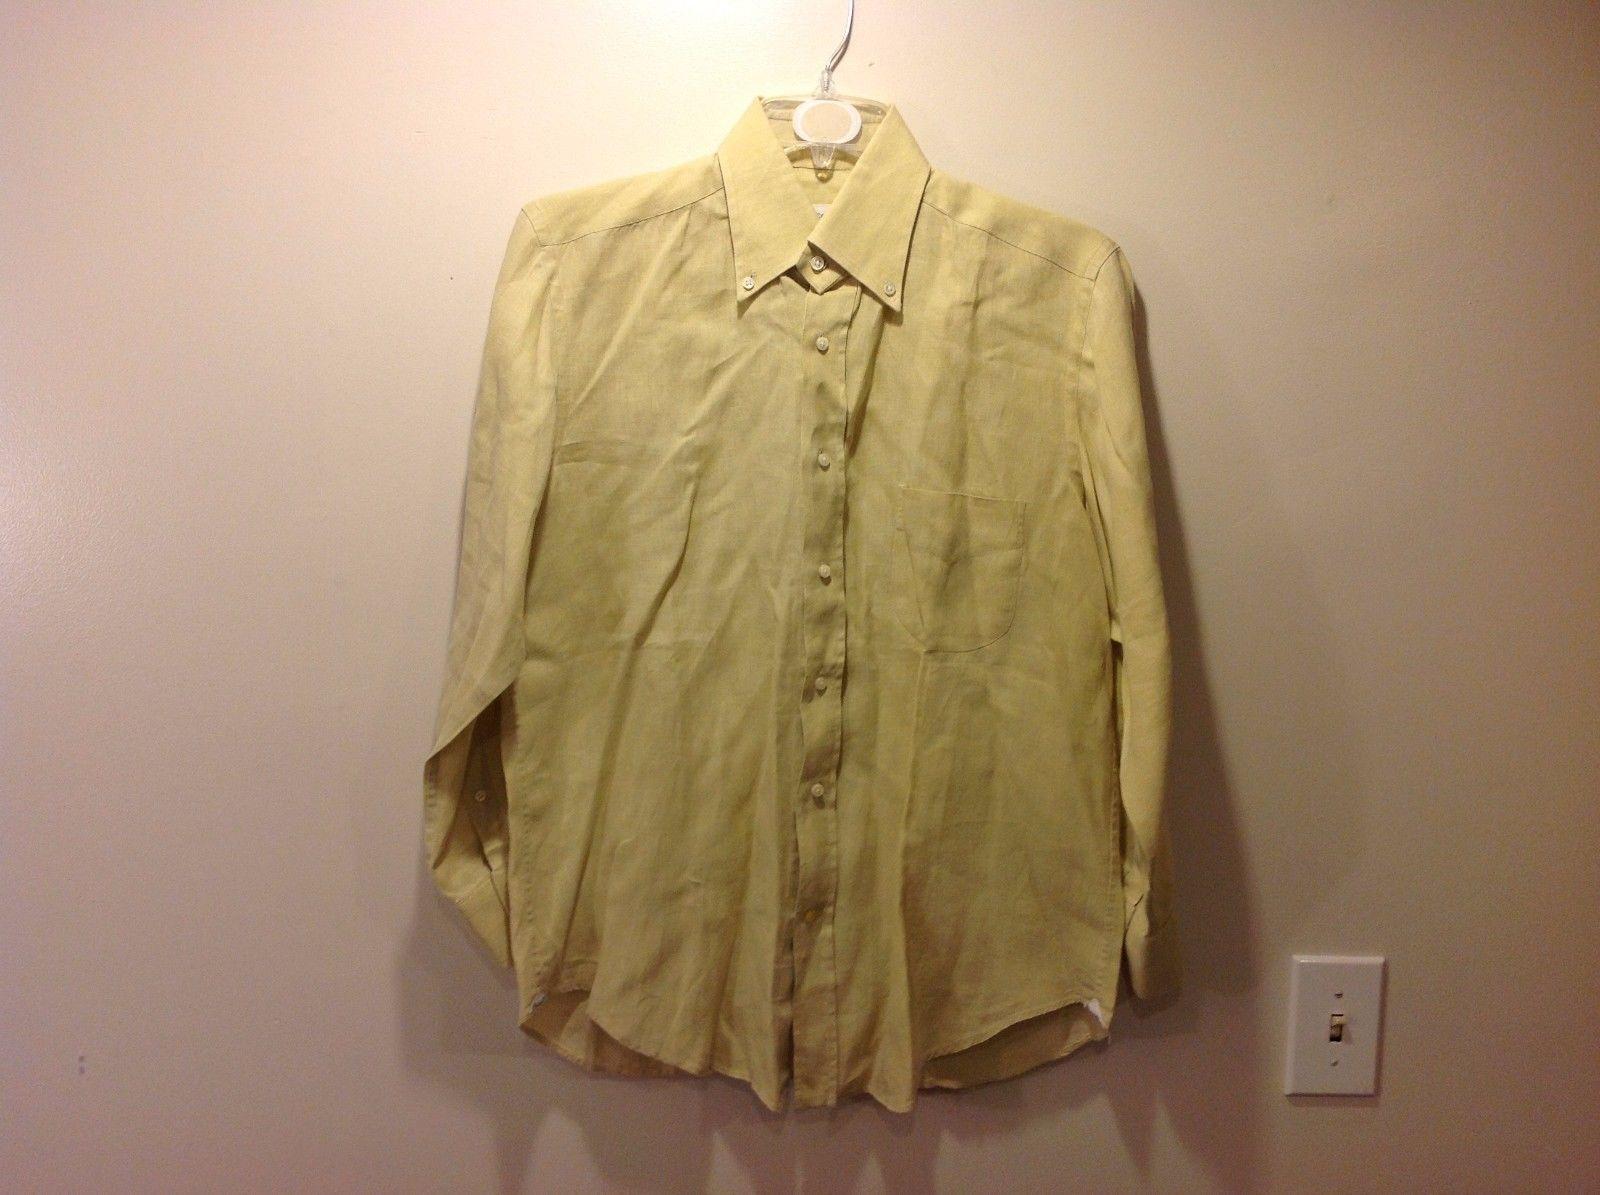 Mens Napoli UGO COLLELA Light Yellowy Green Button Up Shirt Sz 15 38